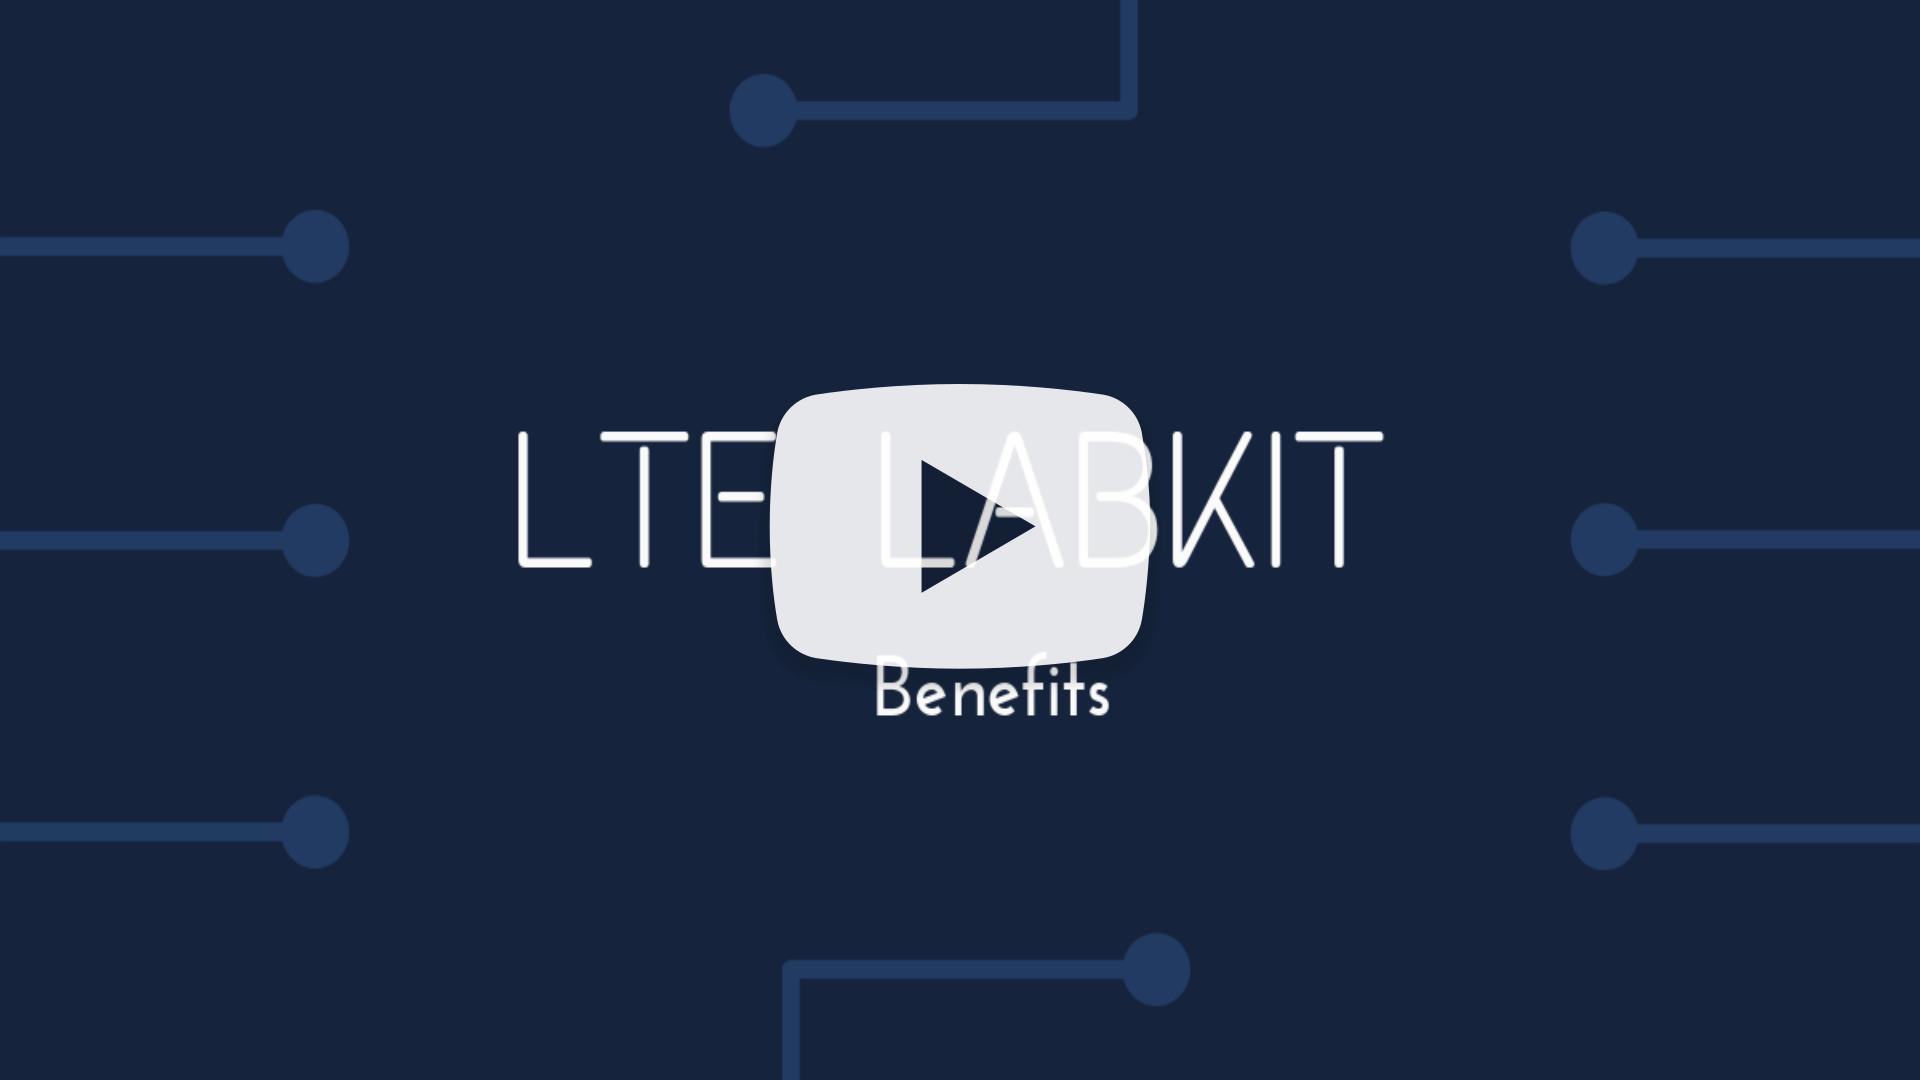 LTE LabKit Webinar - Configuration and practical demonstration 3